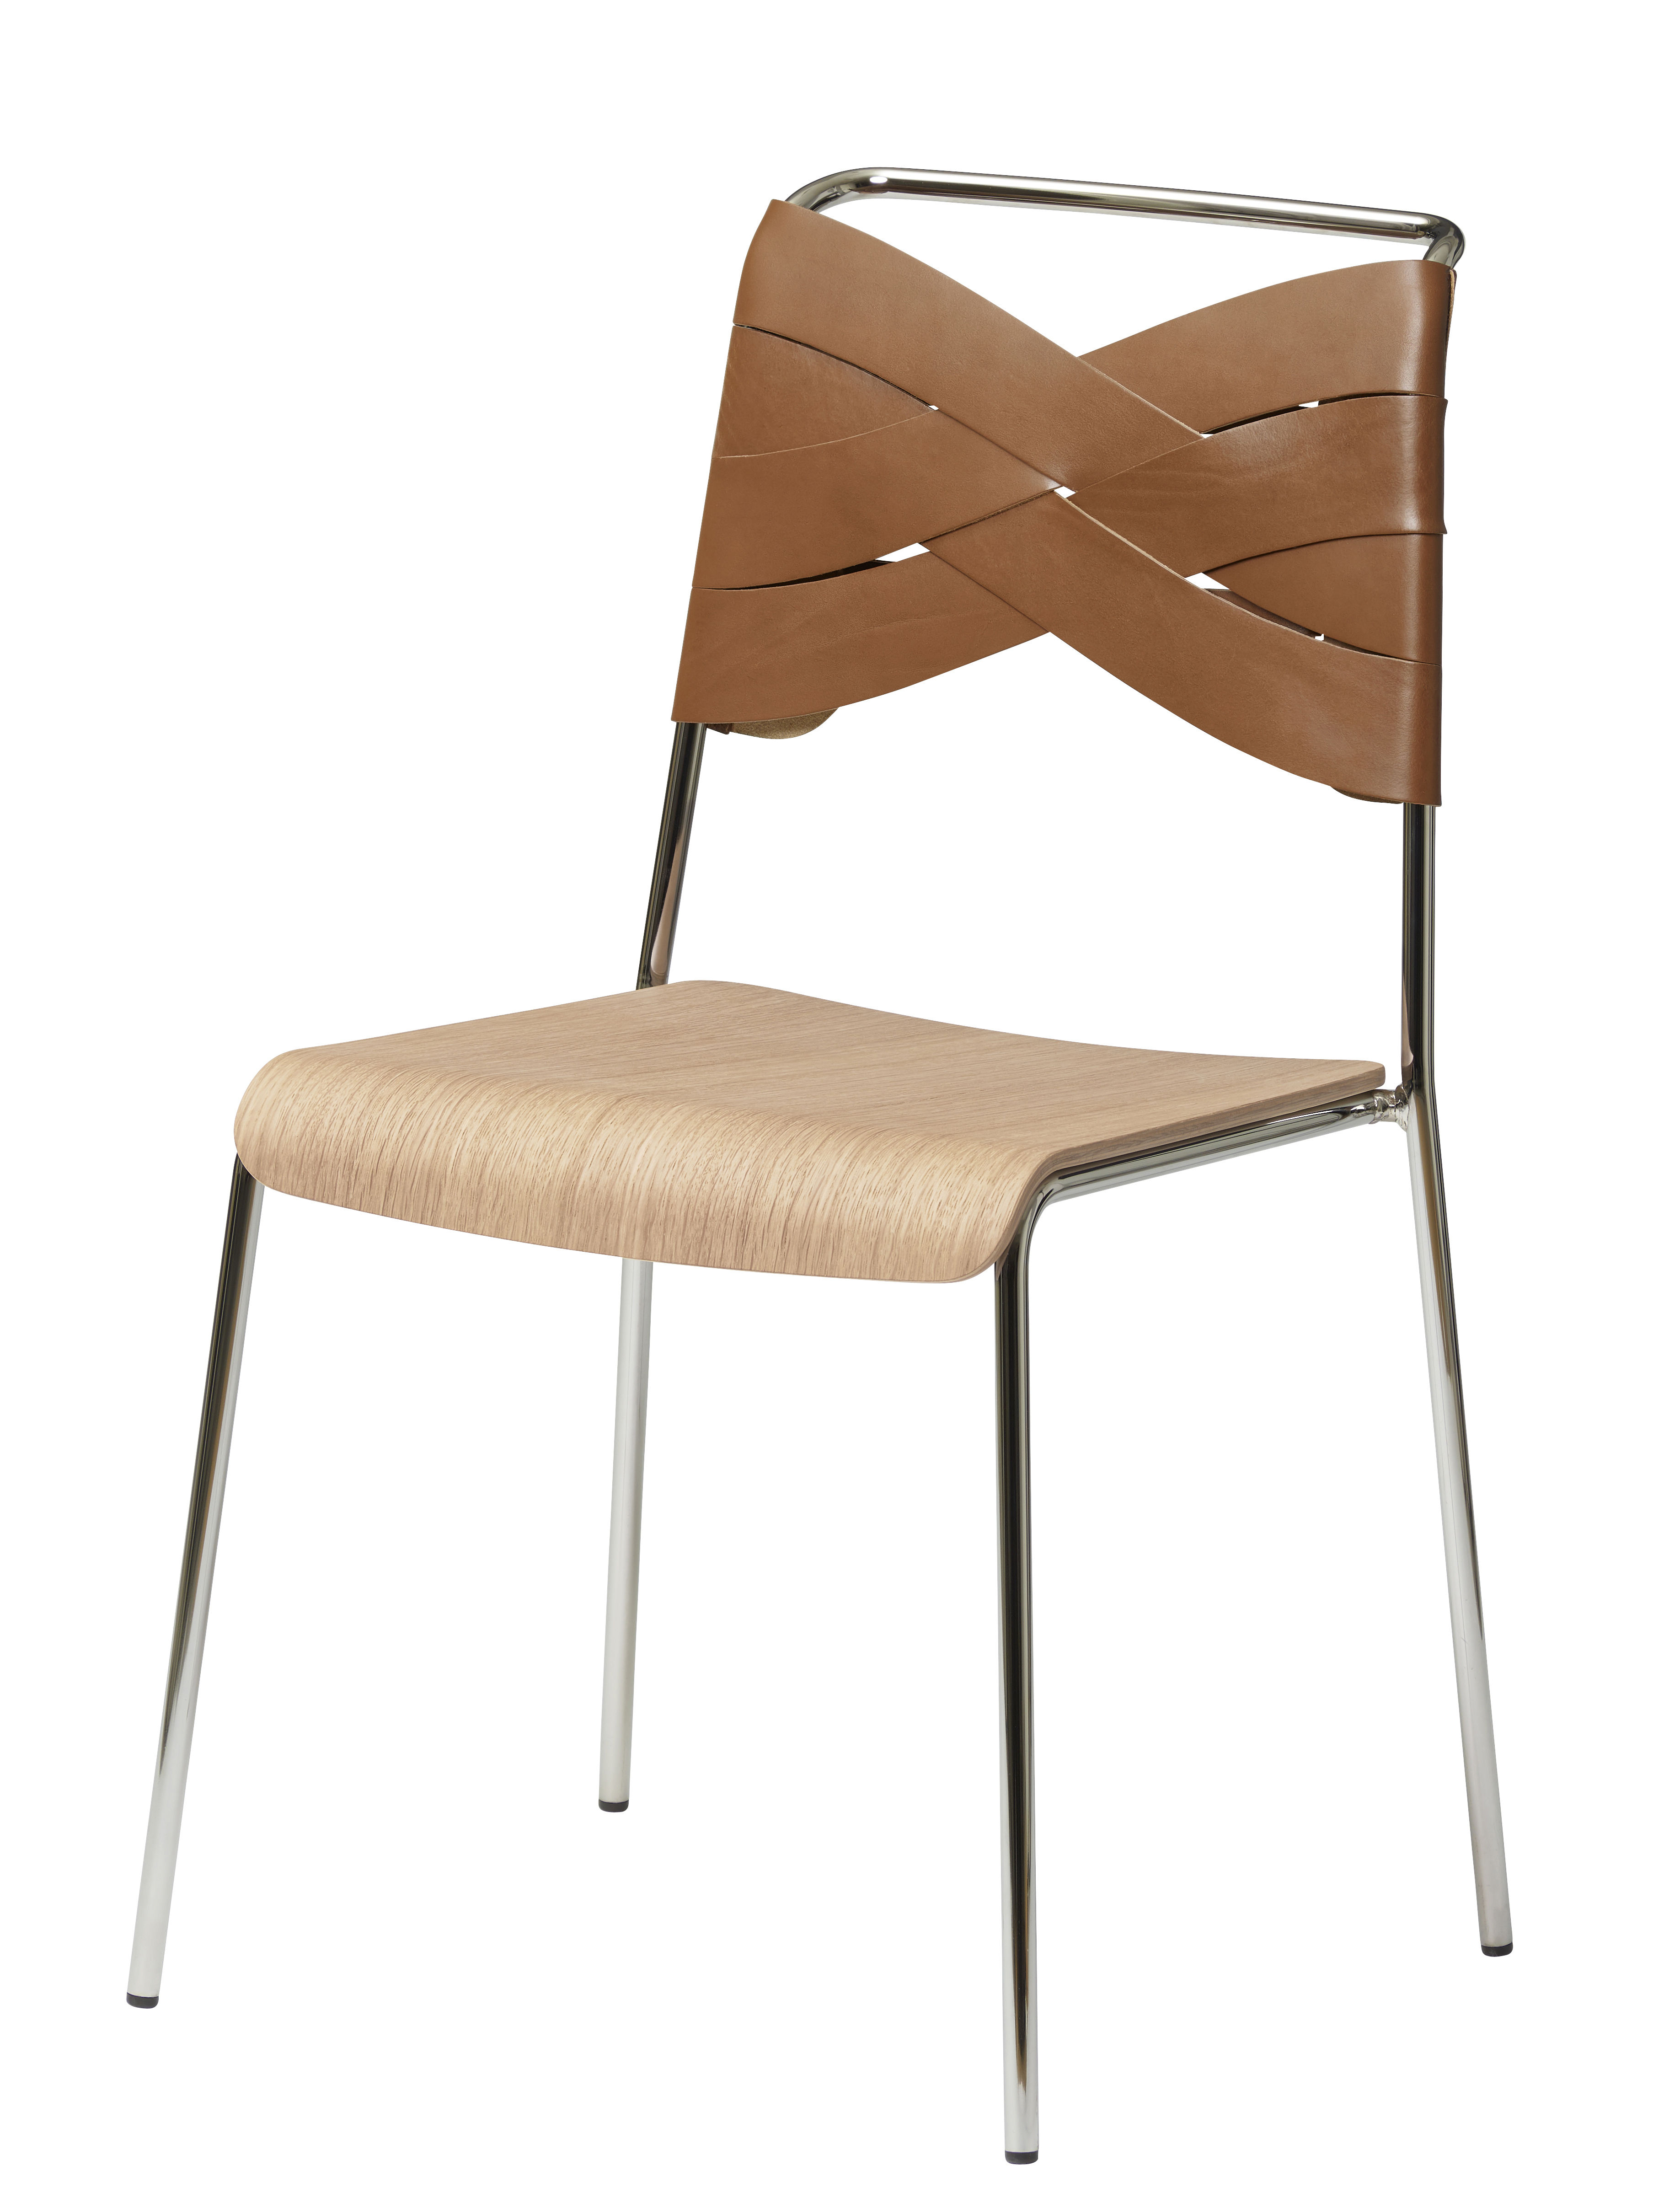 Arredamento - Sedie  - Sedia Torso - / Cuoio di Design House Stockholm - Cuoio cognac / Seduta rovere - Contreplaqué de chêne naturel, Cuir véritable, Metallo cromato